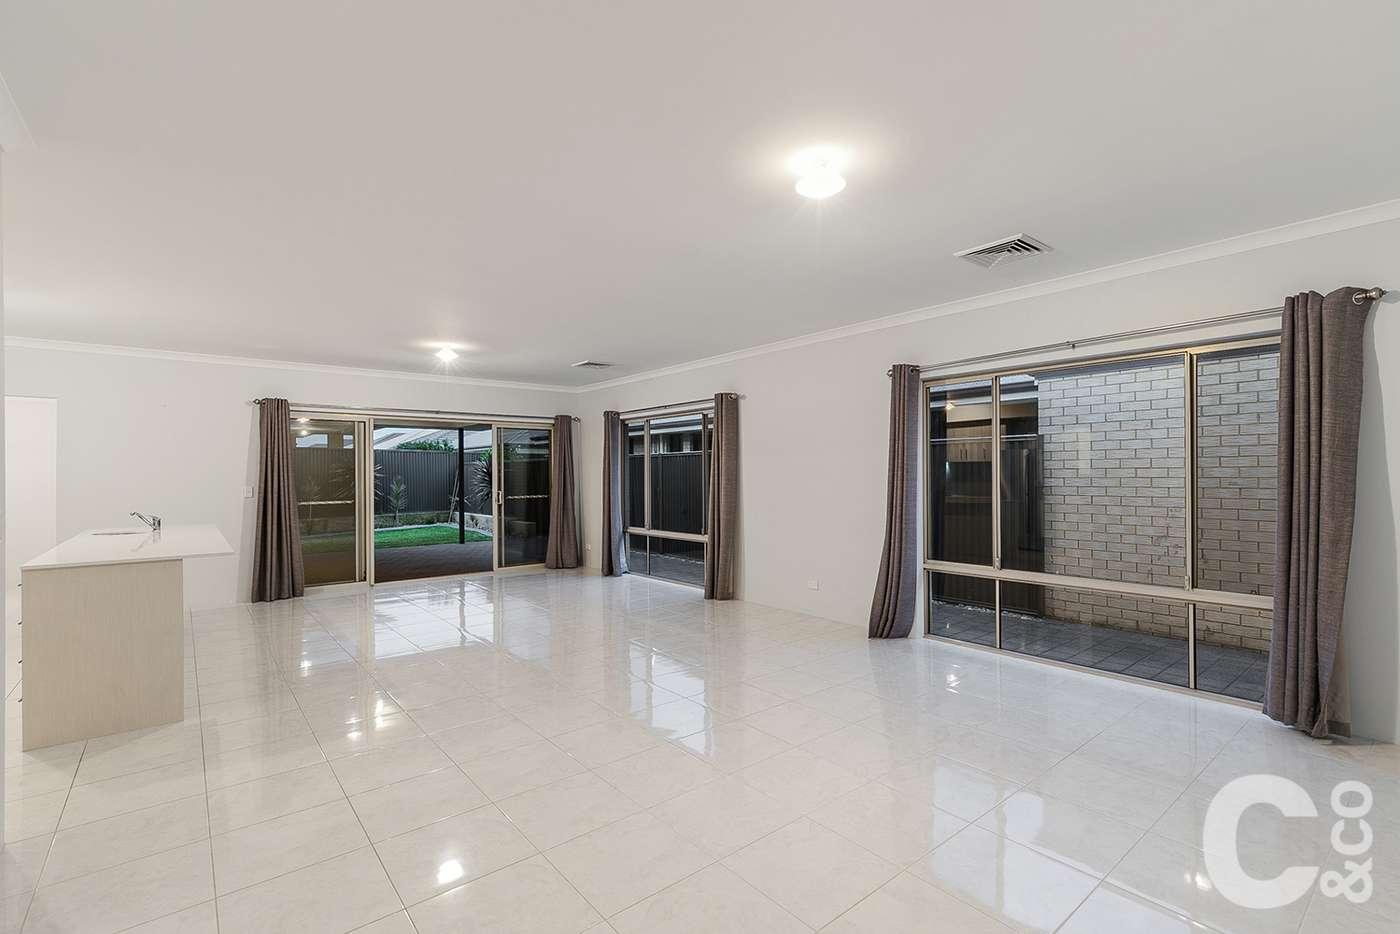 Sixth view of Homely house listing, 11 Daybreak Loop, Wellard WA 6170